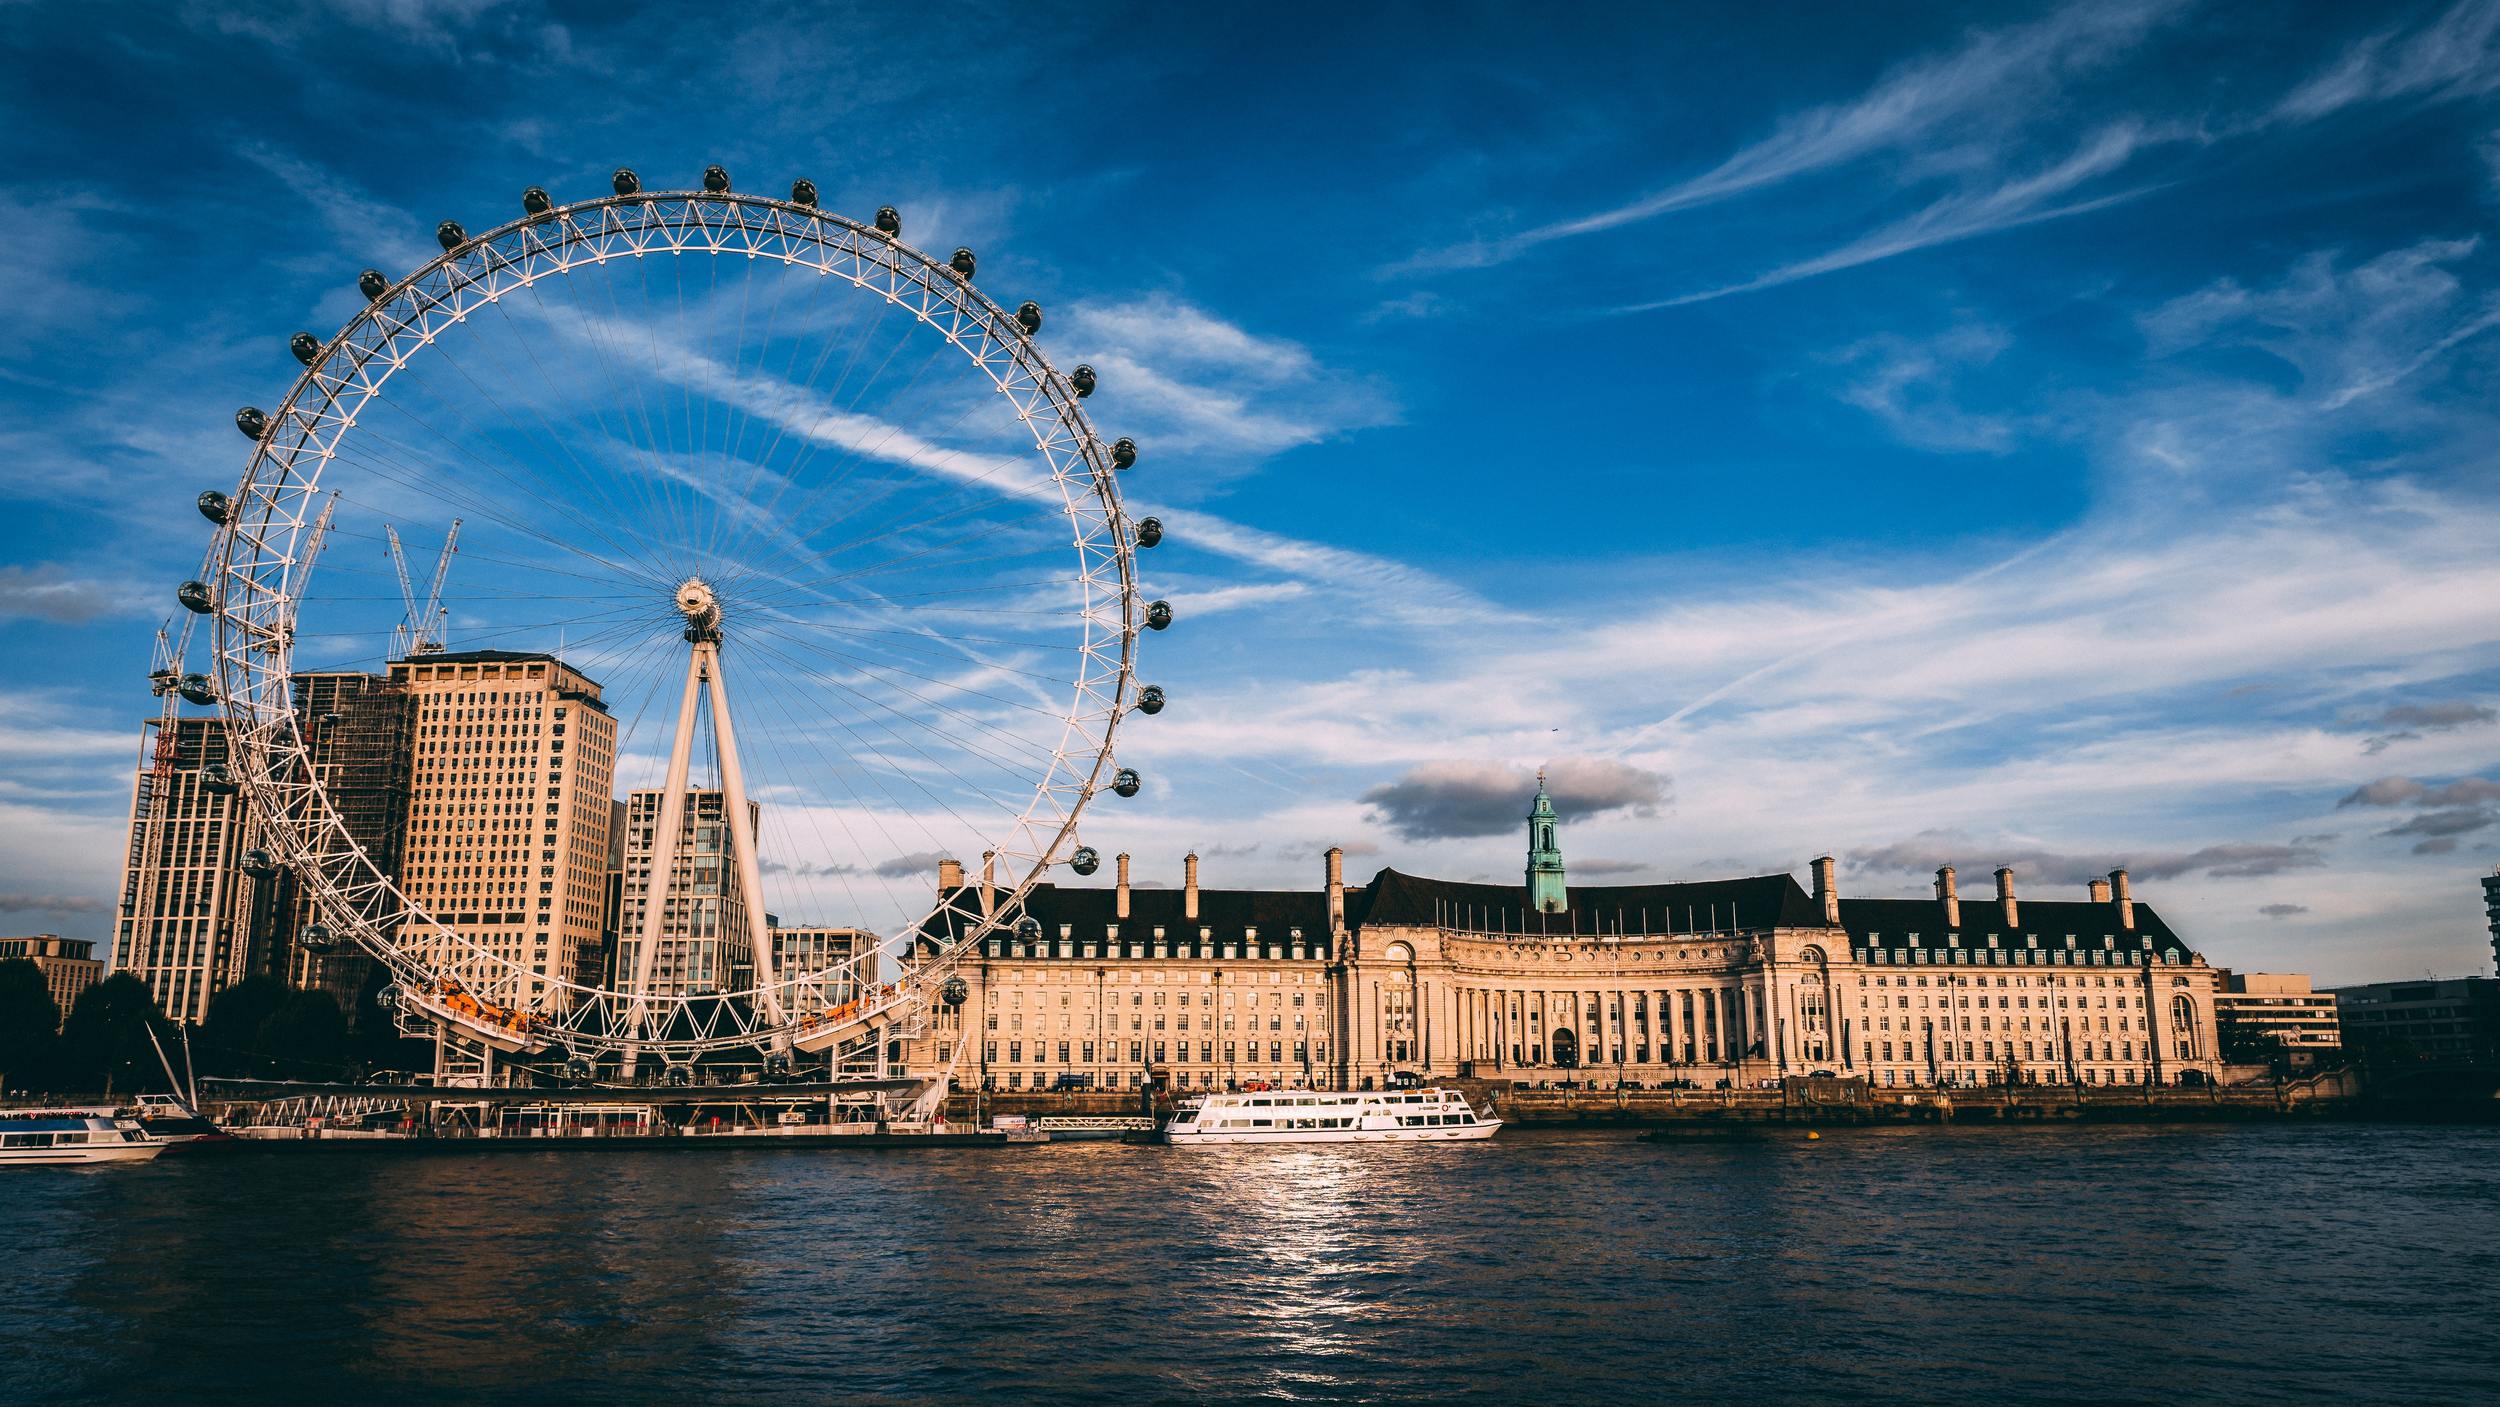 London Eye - Best Things to do in London in 48 Hours